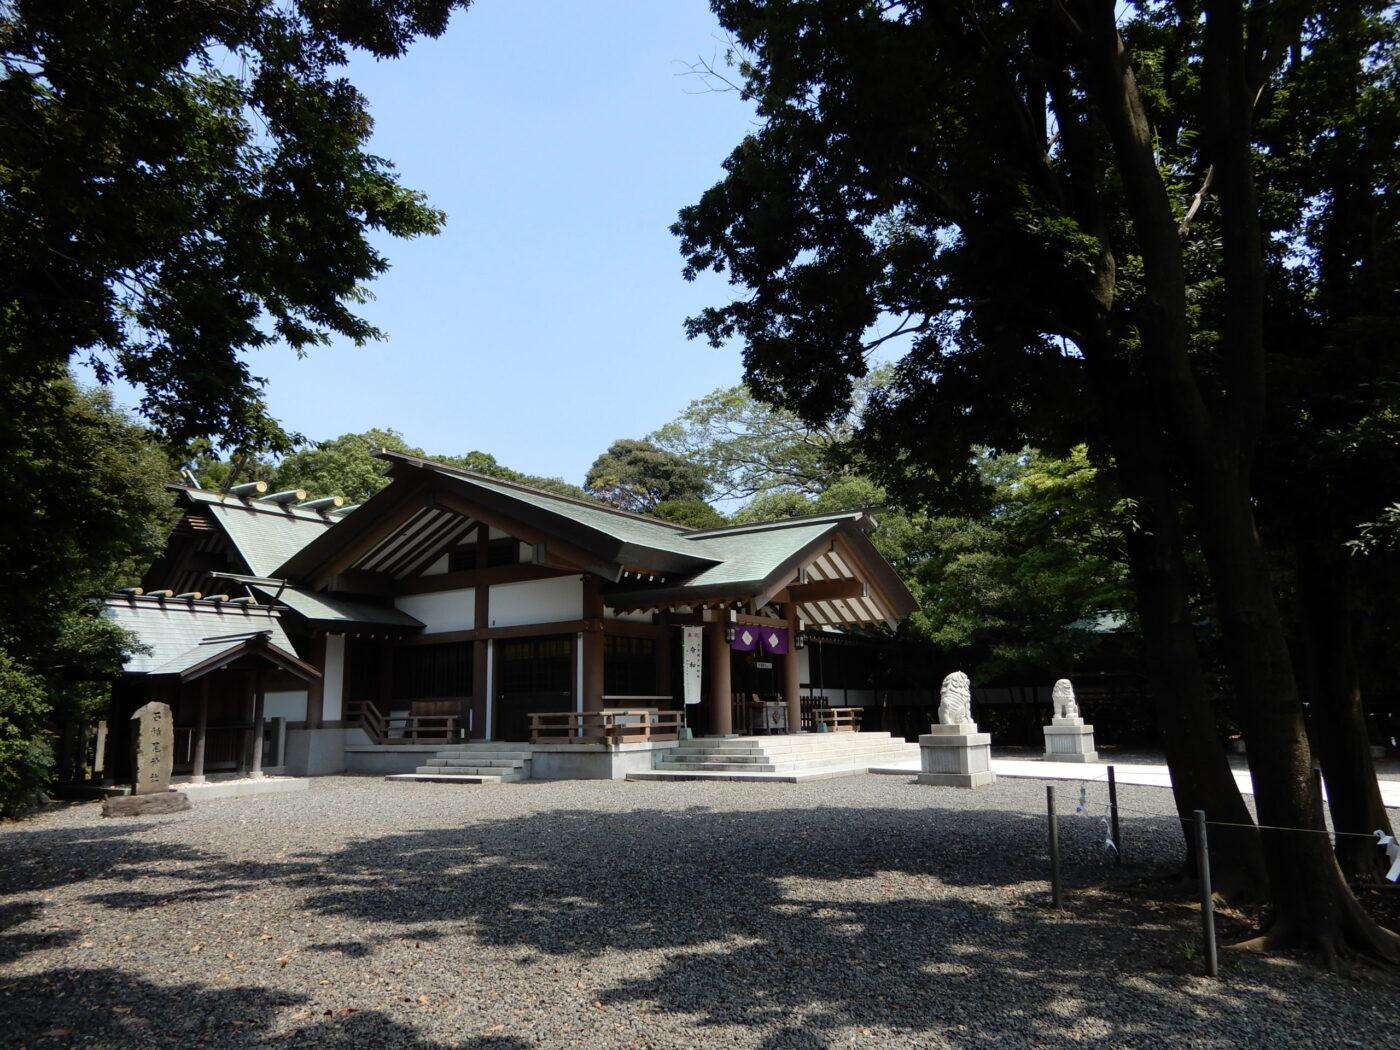 鵠沼皇大神宮の写真